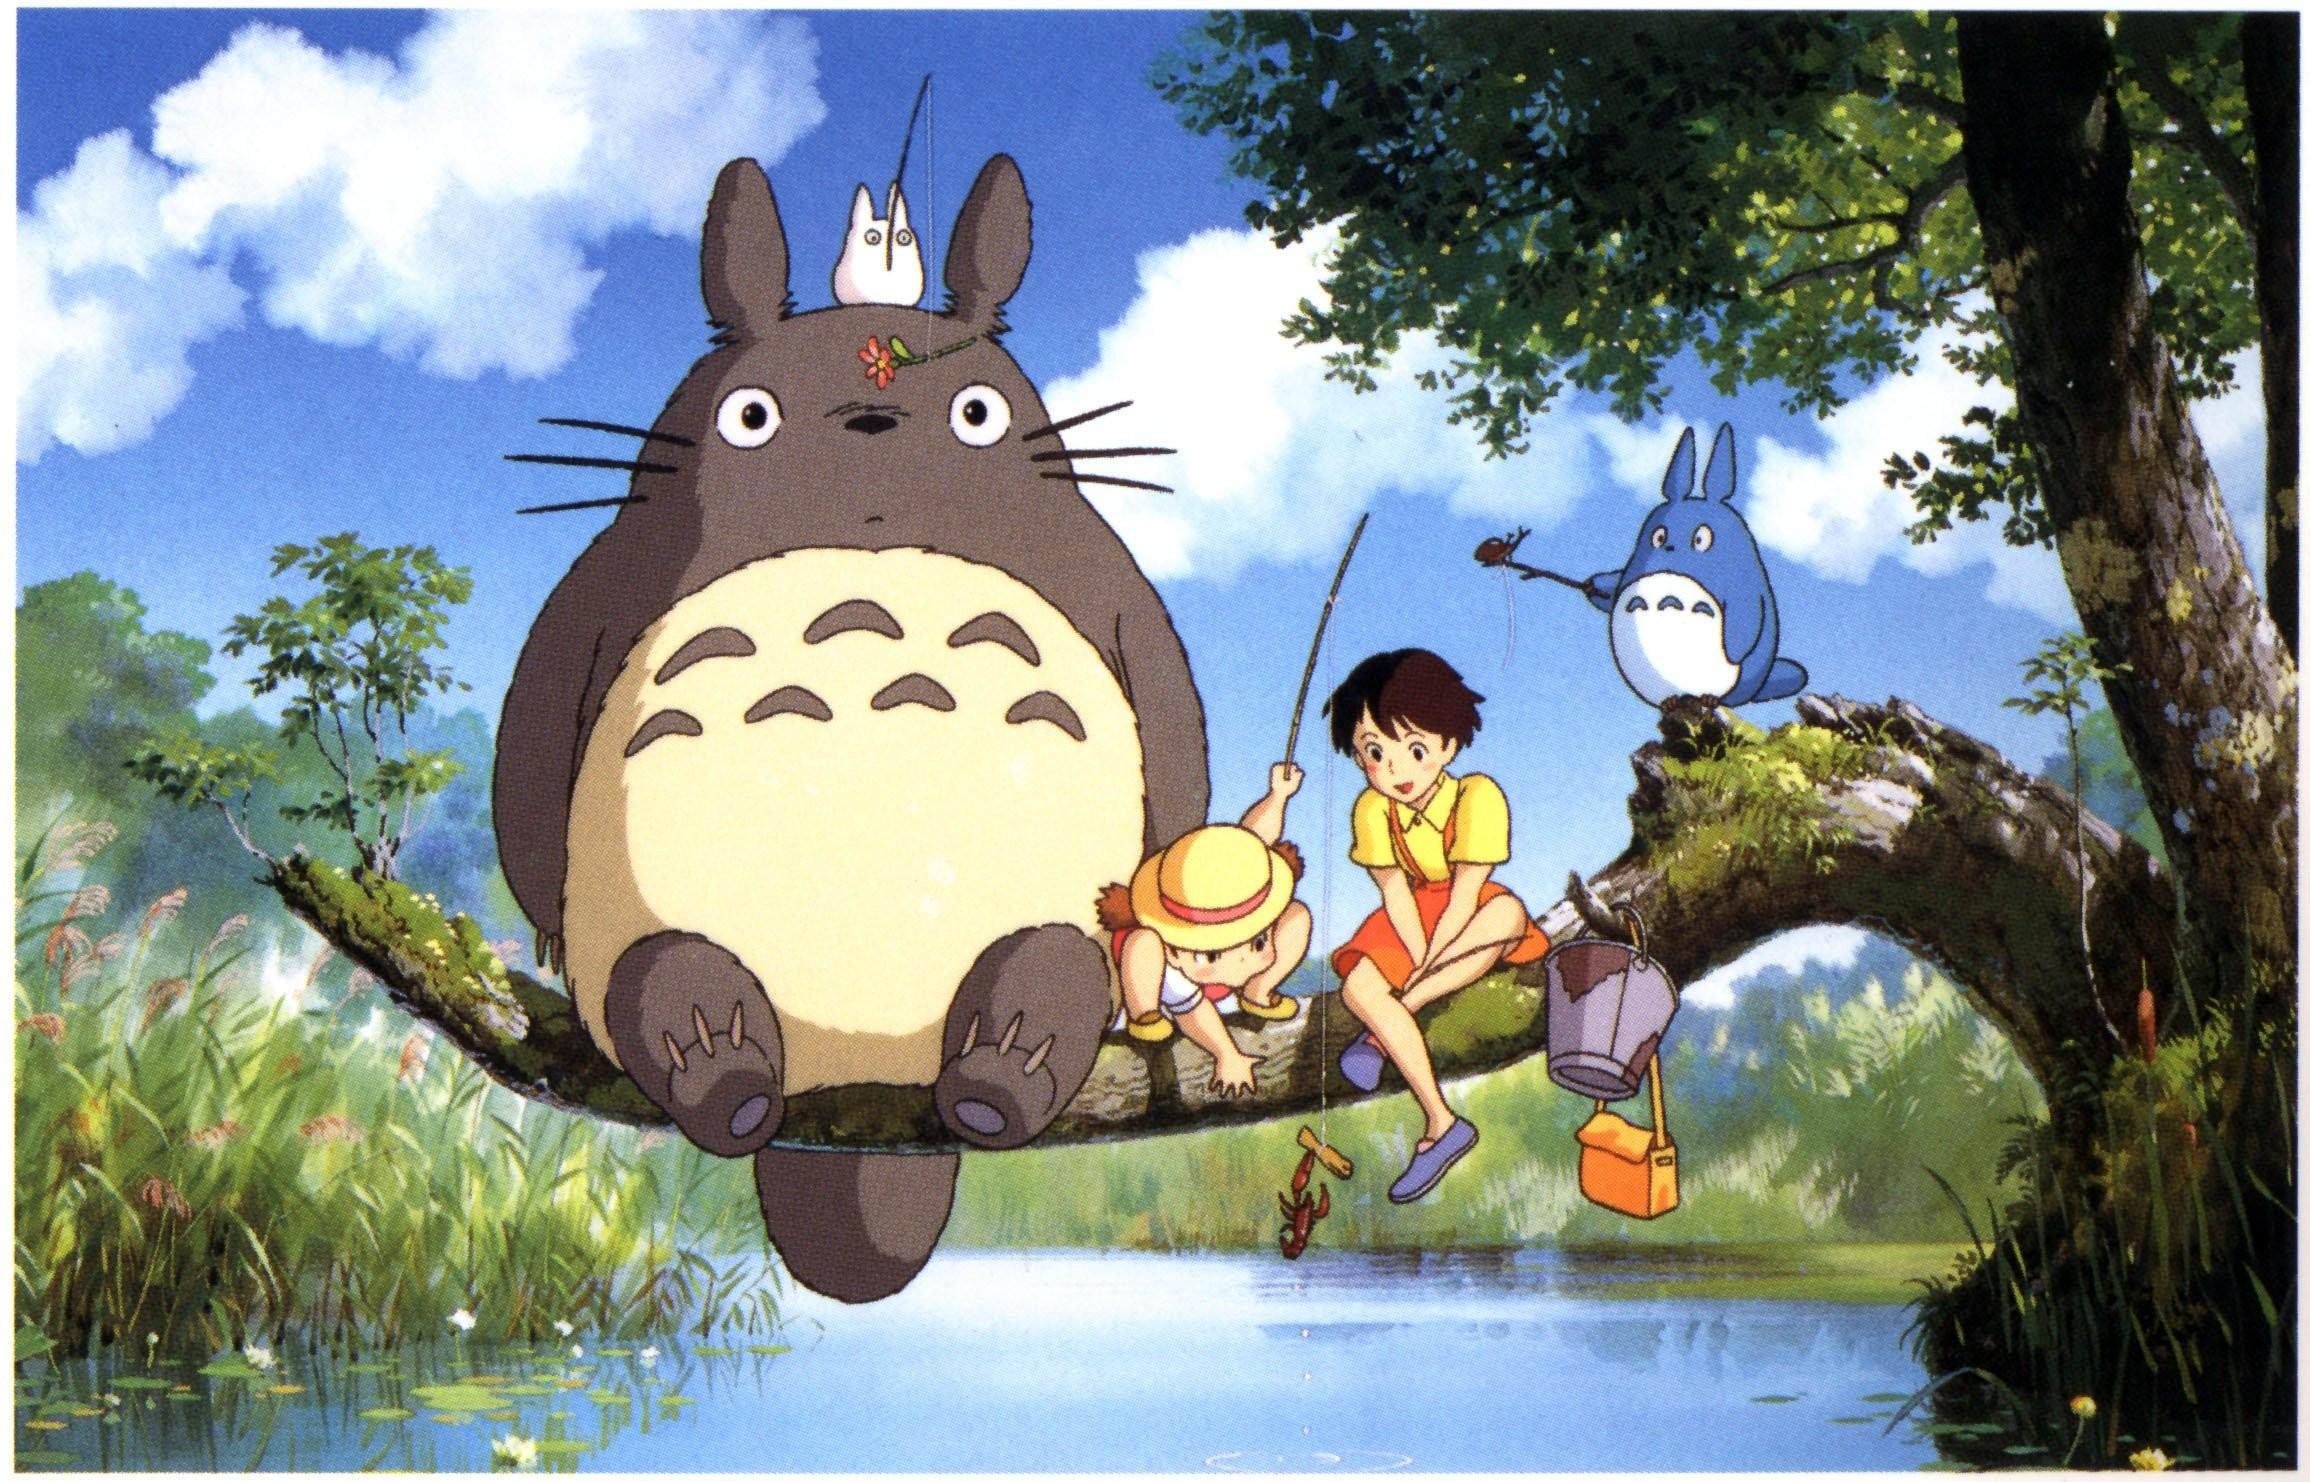 Studio Ghibli Totoro My Neighbor Spirited Away Sen To Chihiro No  Kamikakushi Howl's Moving Castle Kiki's Delivery Service Princess Mononoke  124724 …